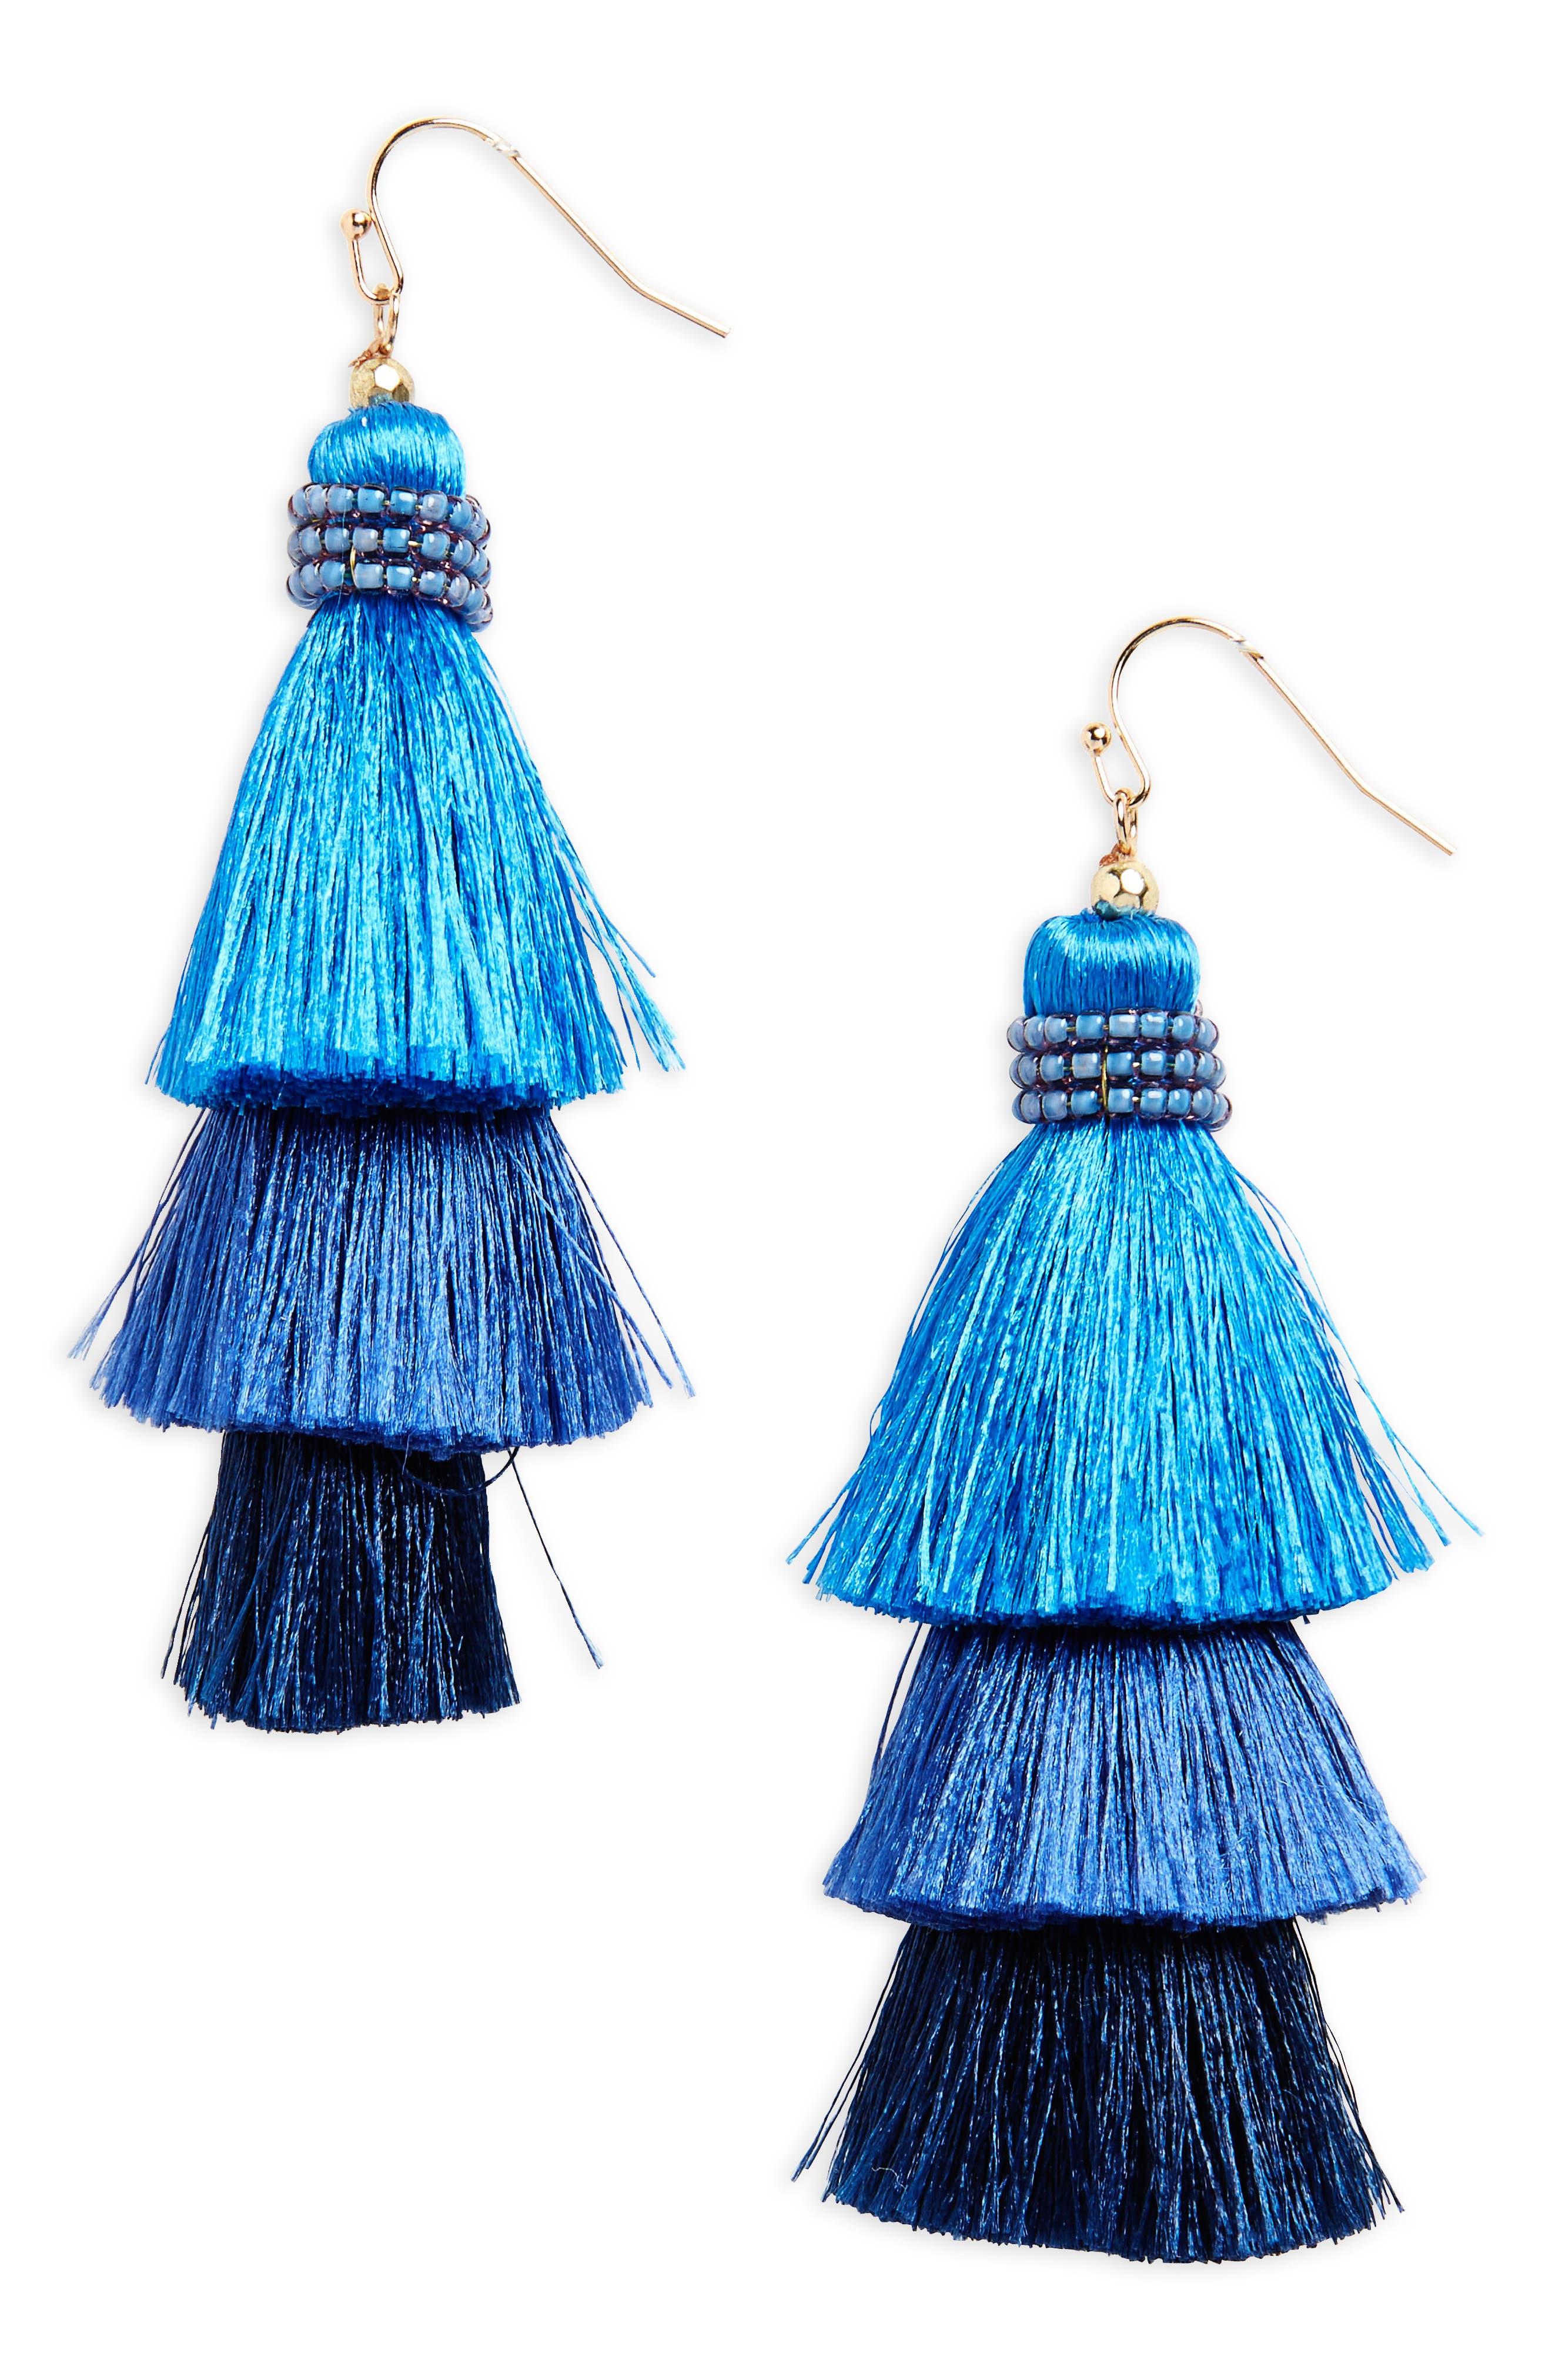 Tiered Tassel Earrings,                         Main,                         color, 410